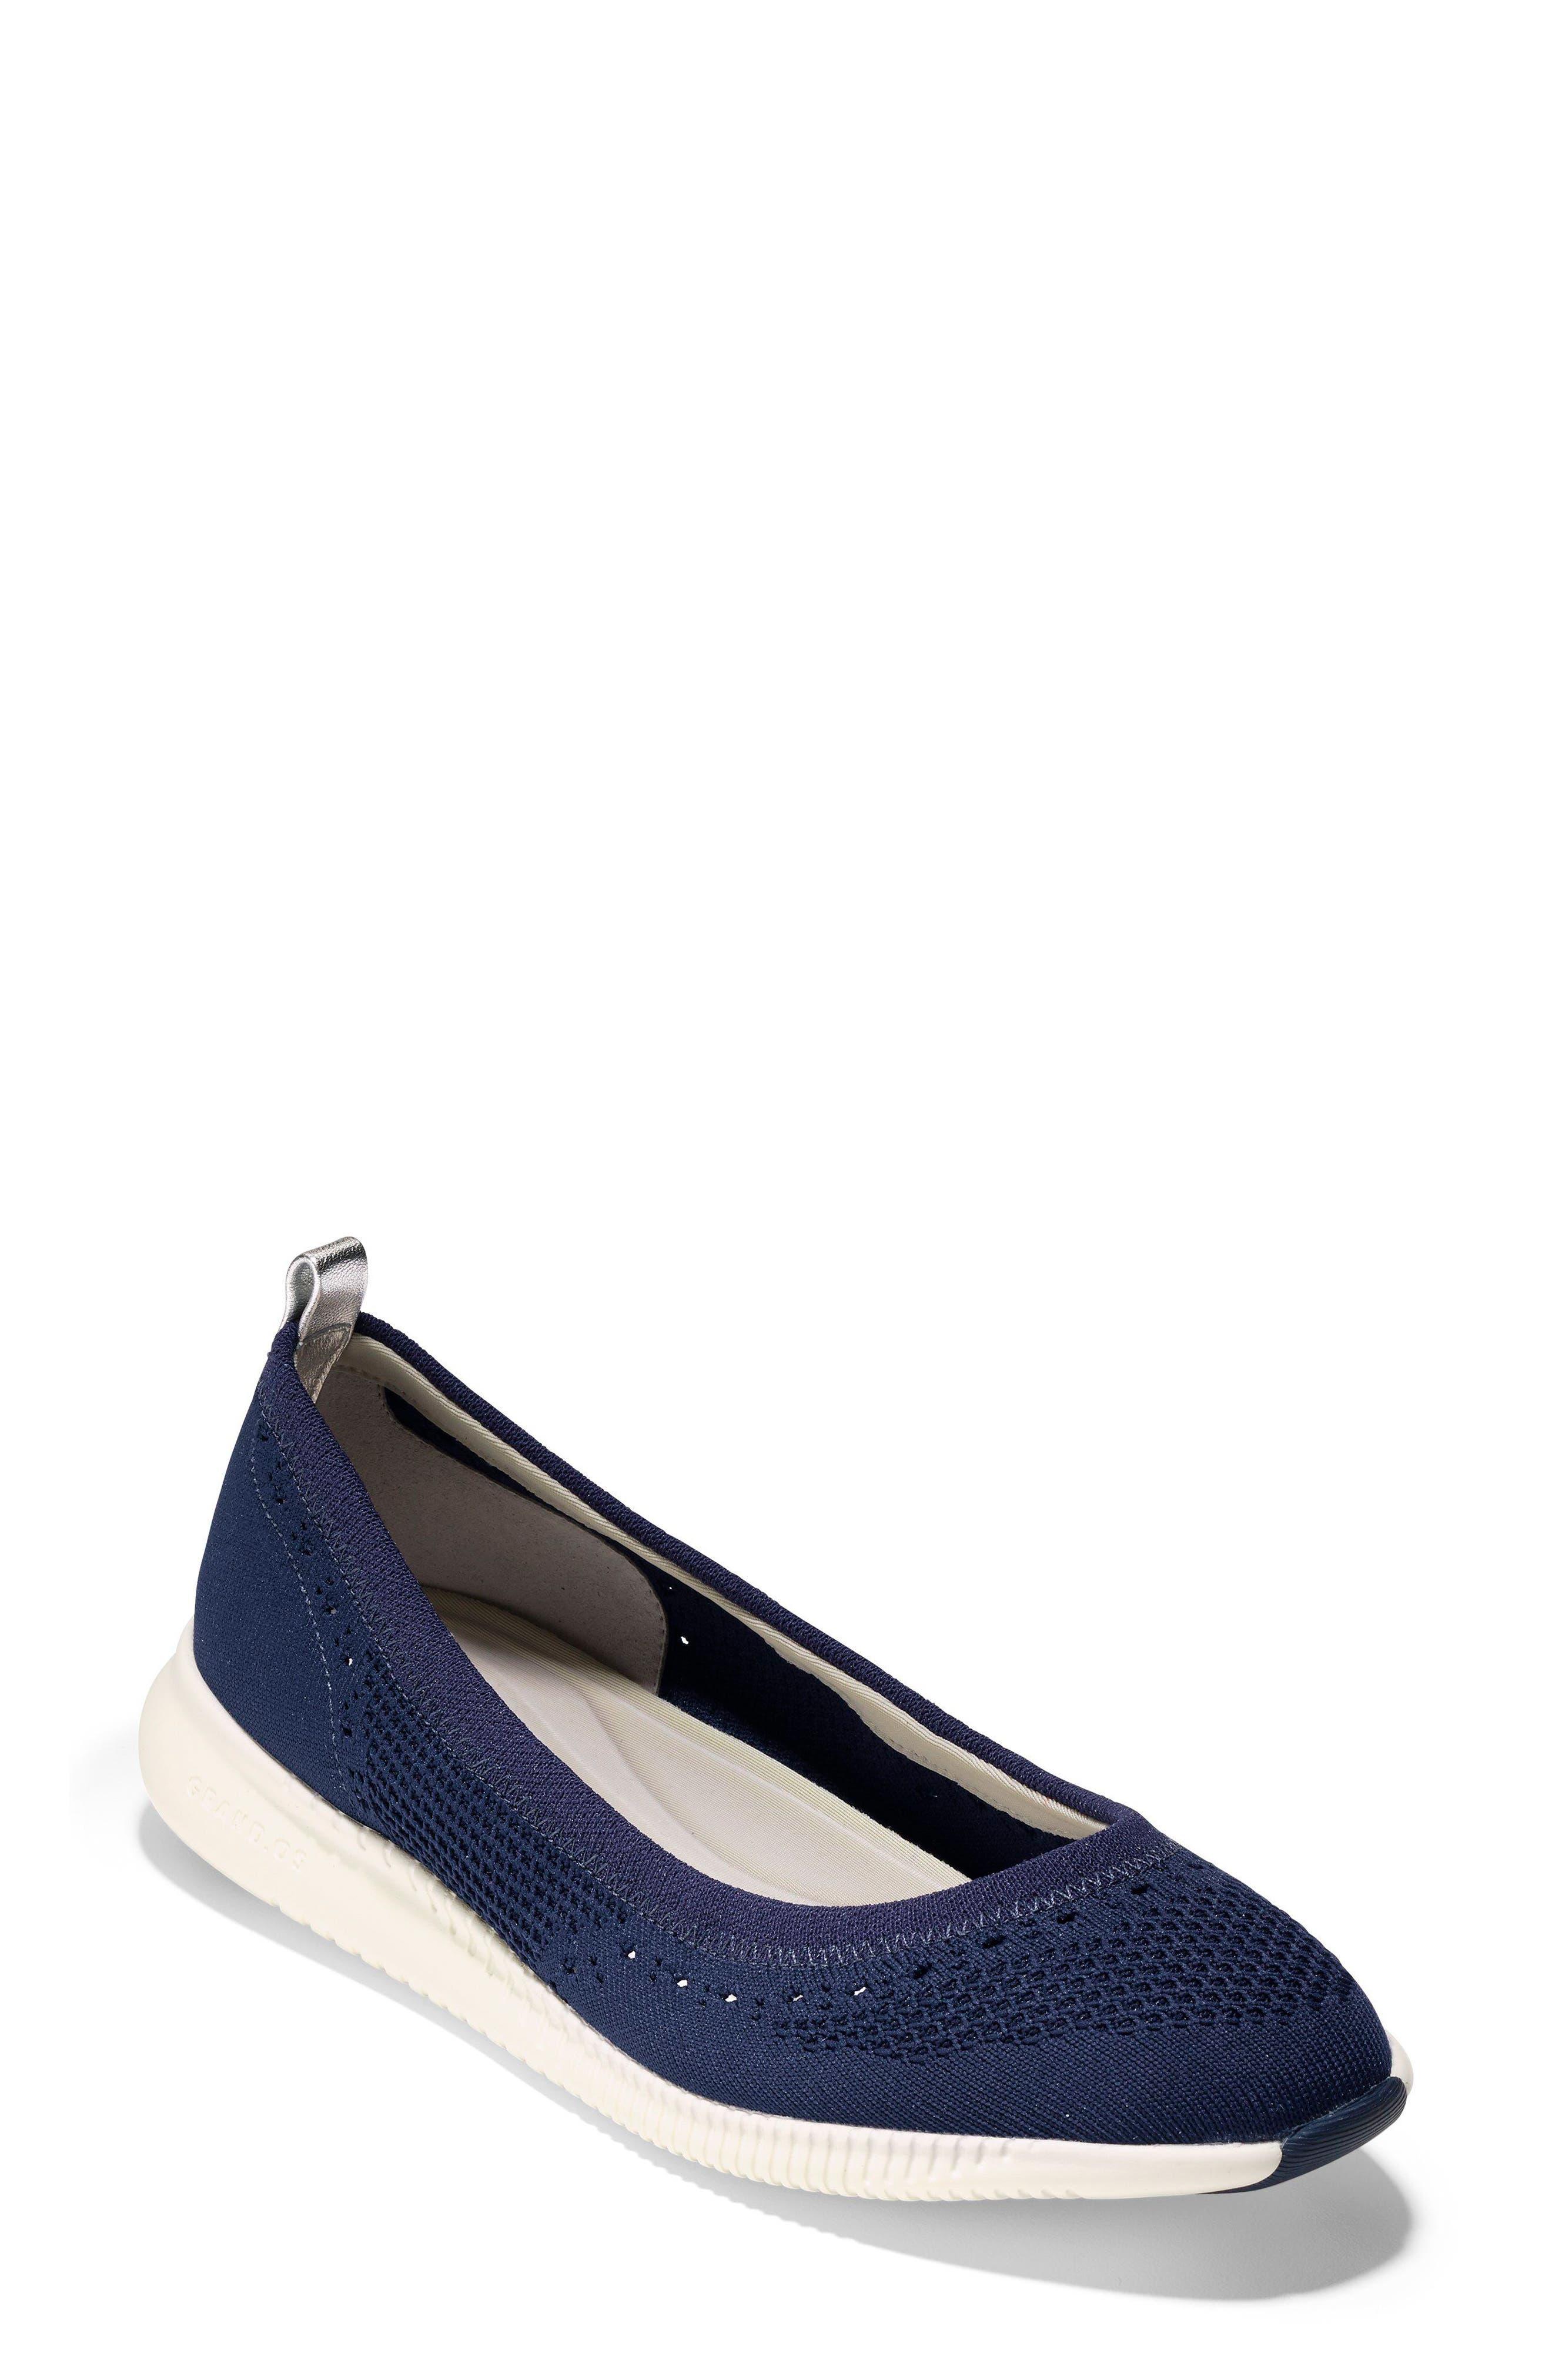 2.ZERØGRAND Stitchlite Ballet Flat,                             Main thumbnail 1, color,                             MARINE BLUE KNIT